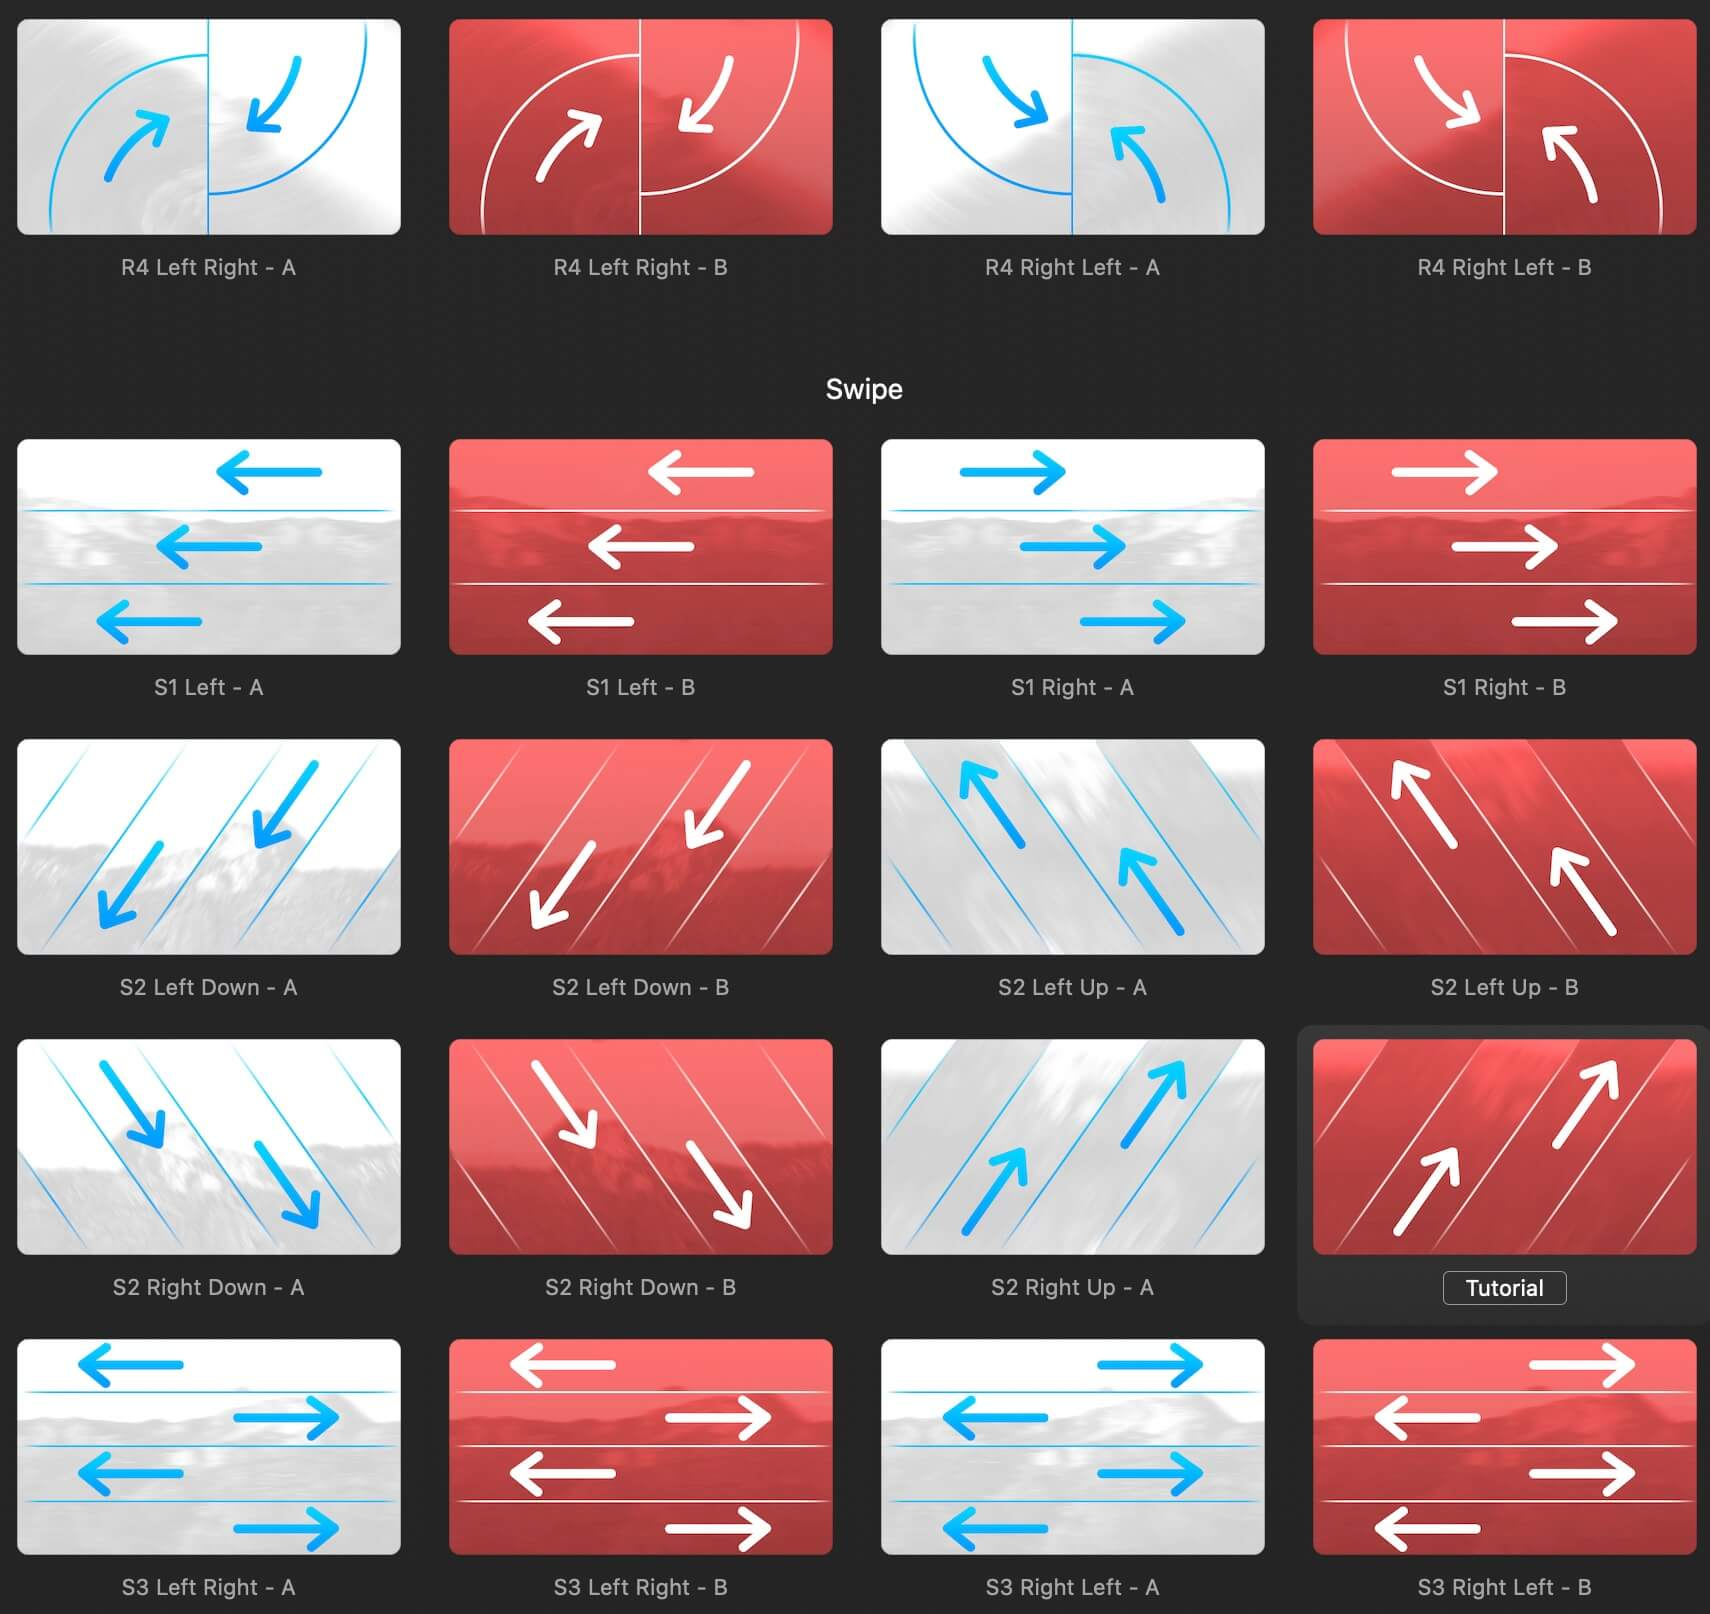 fcpx转场插件 88种平滑动态过渡转场预设 Dynamic Transitions V2